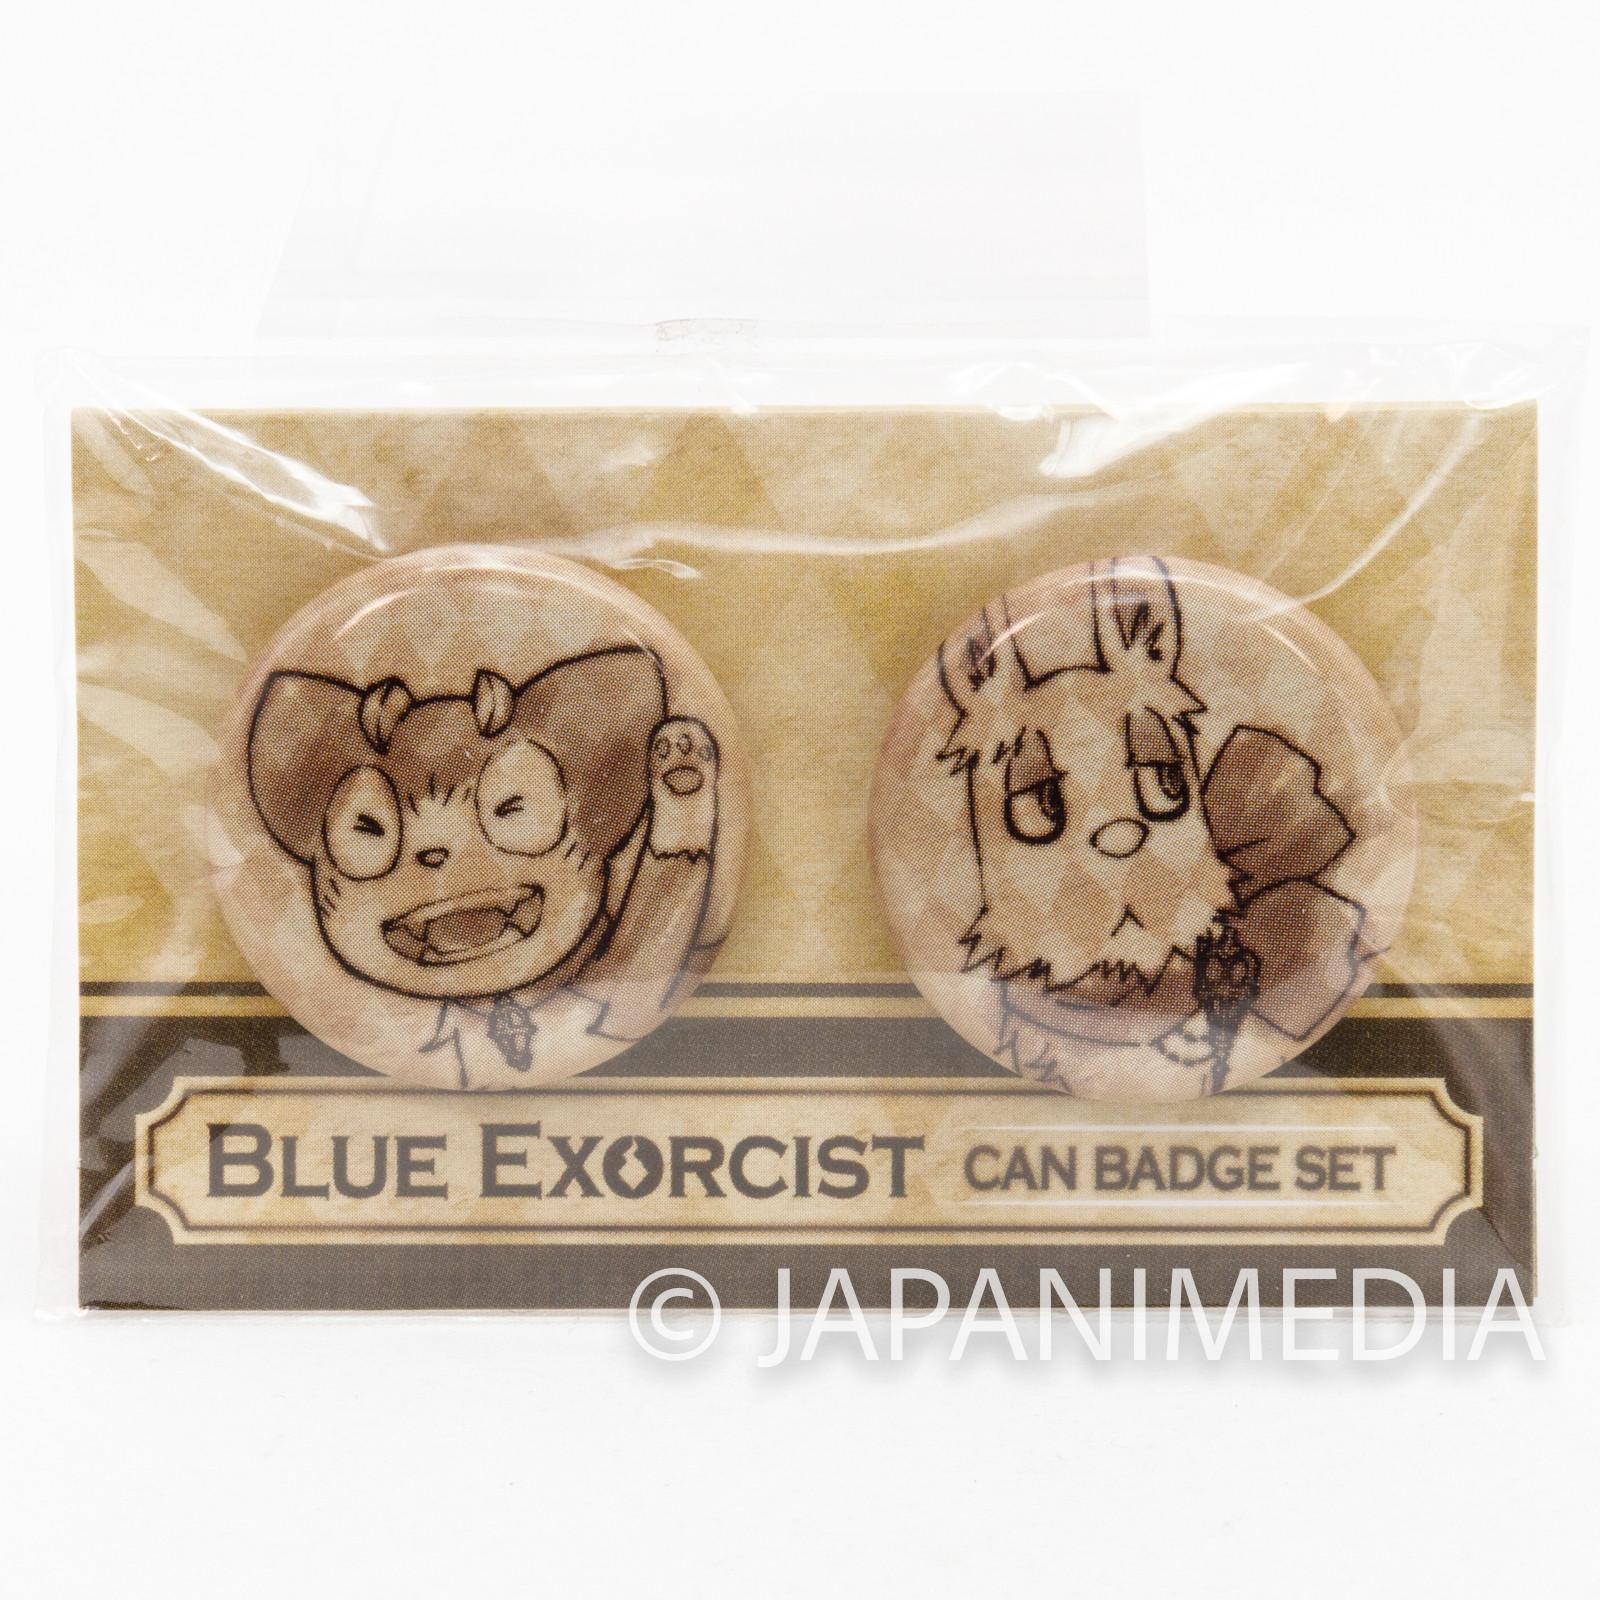 Blue Exorcist Mephisto Dog & Kuro Cat Can Badge Pins Set JAPAN ANIME